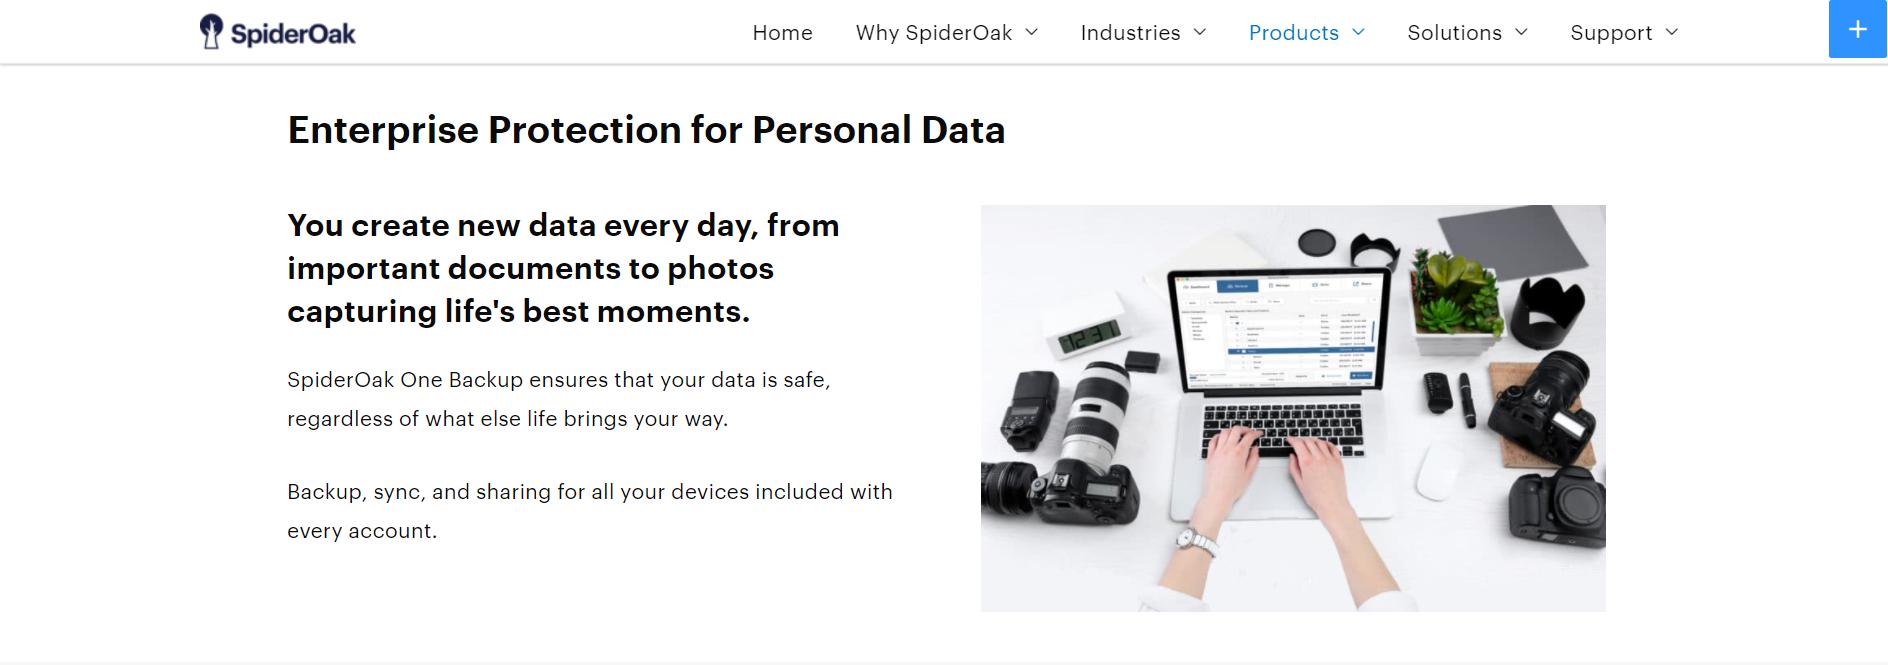 spideroak cloud storage product page